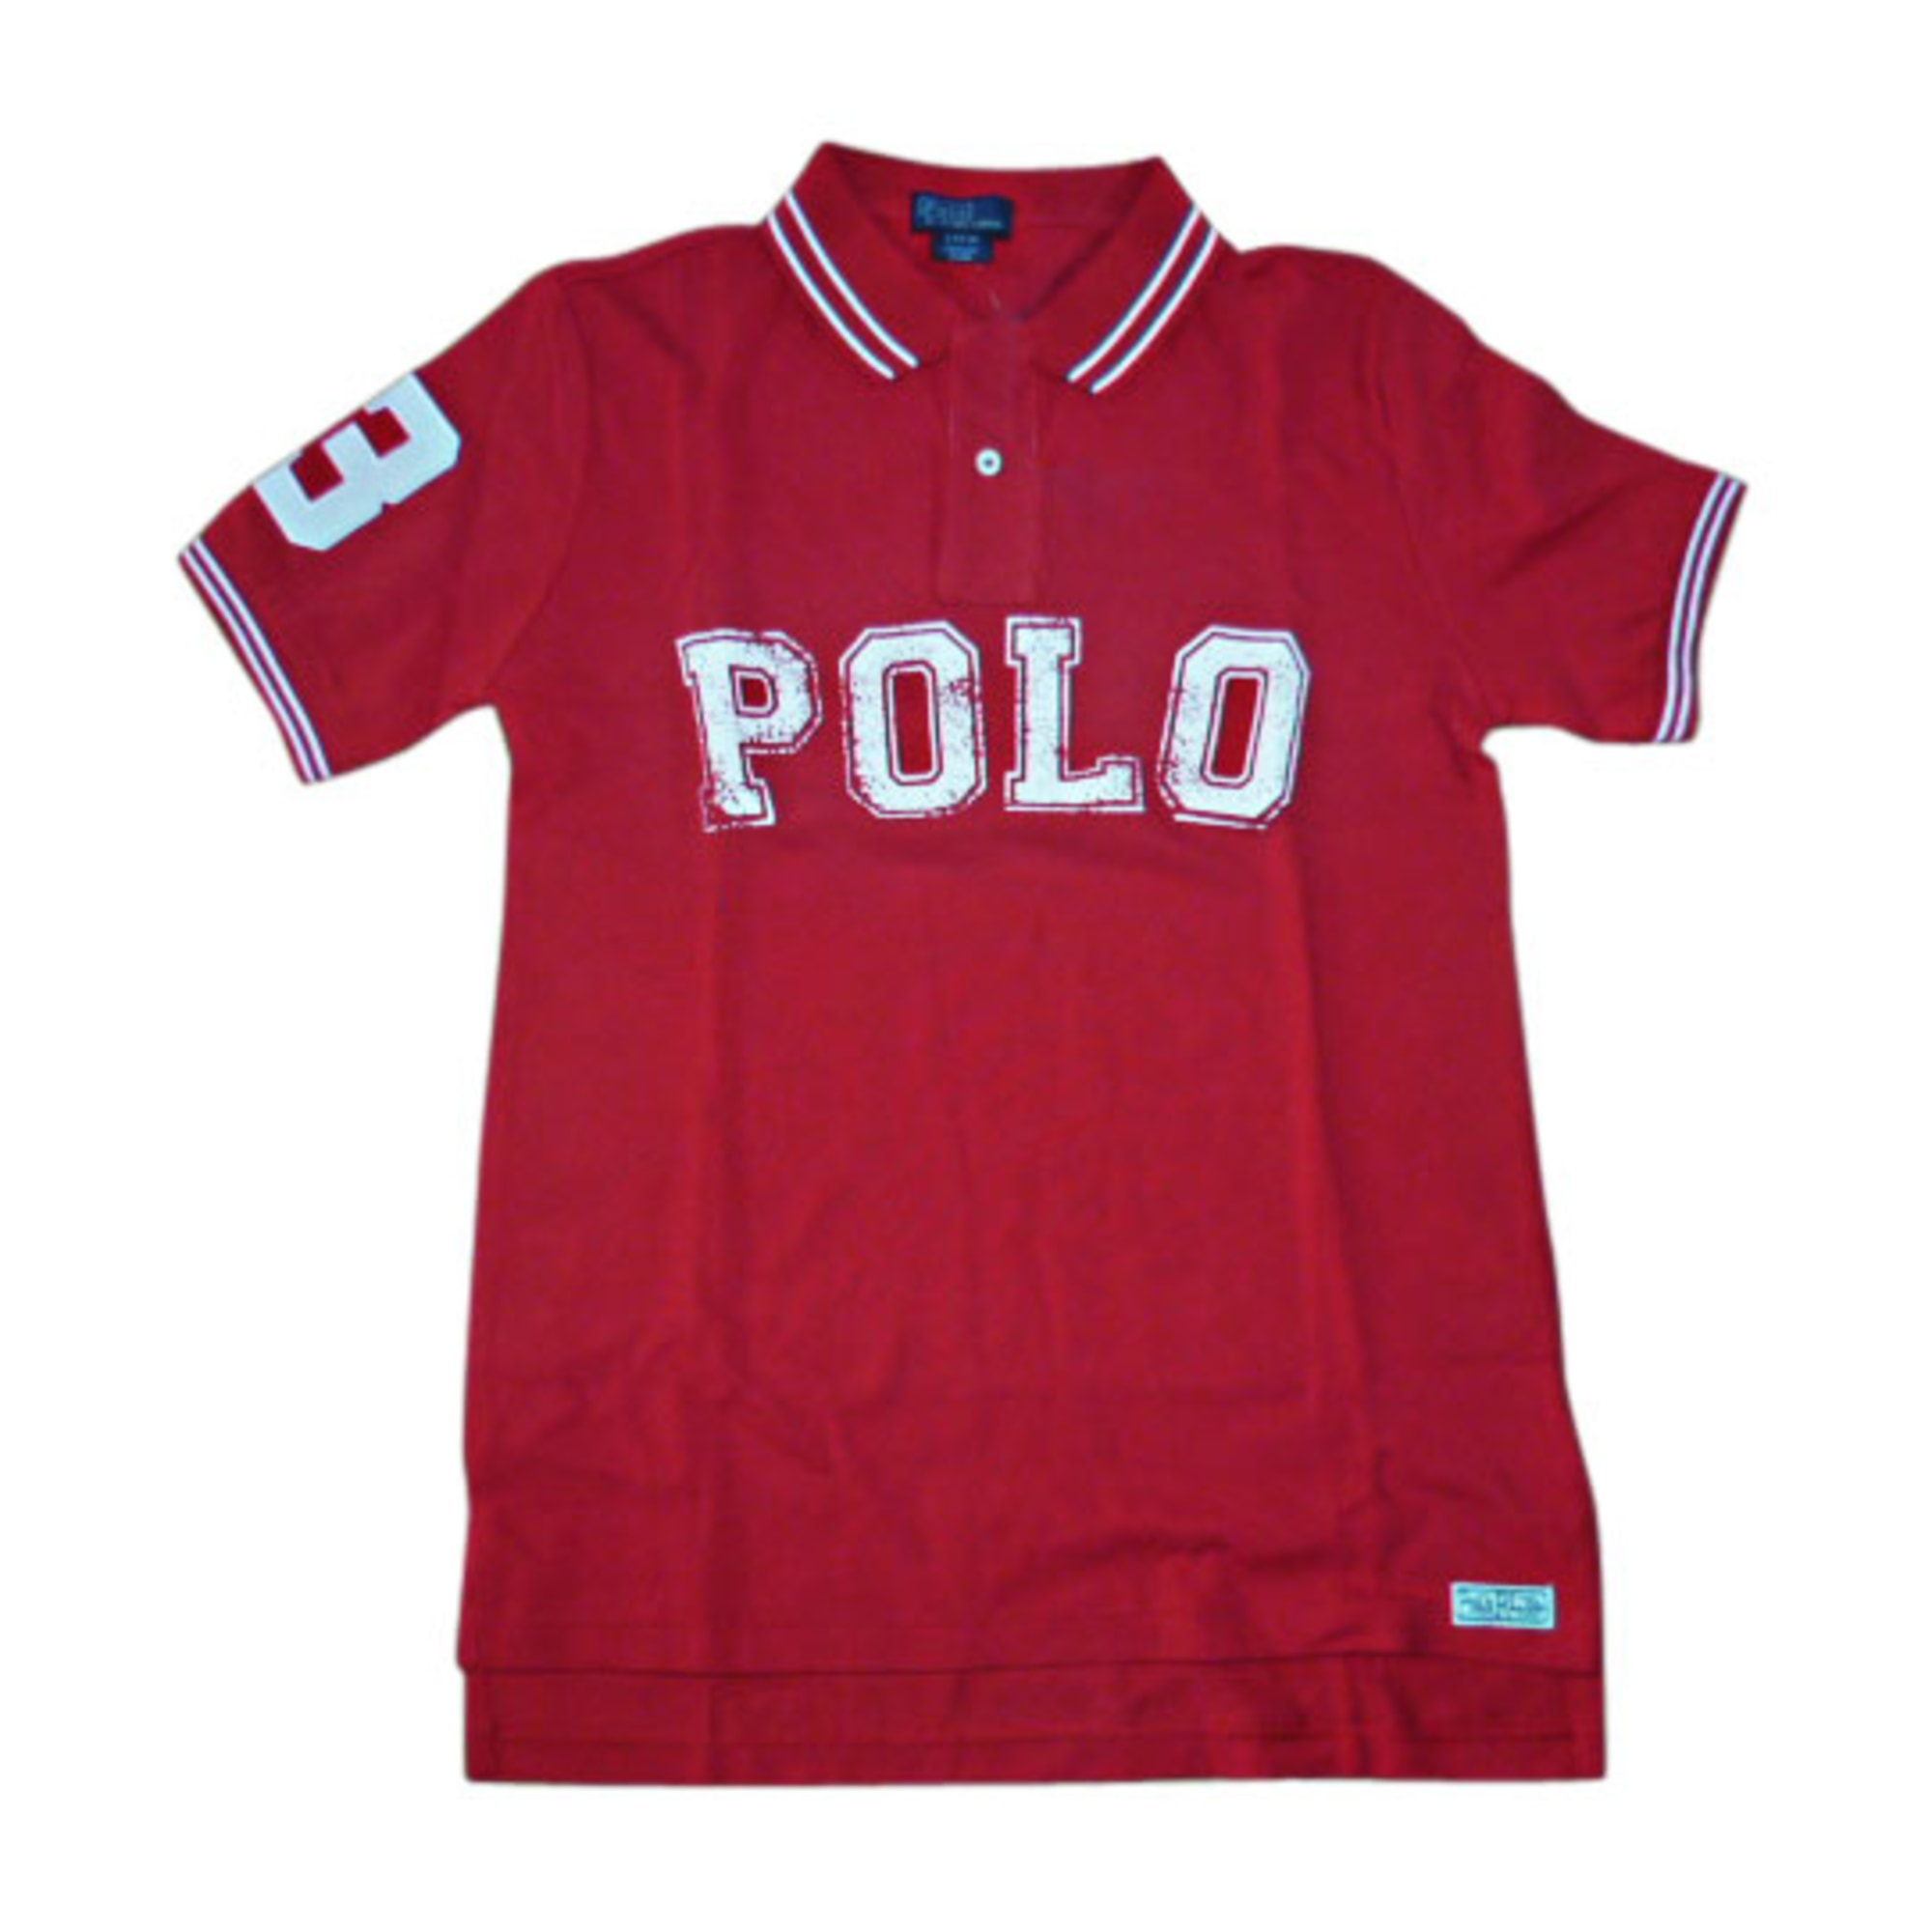 Polo RALPH LAUREN Red, burgundy